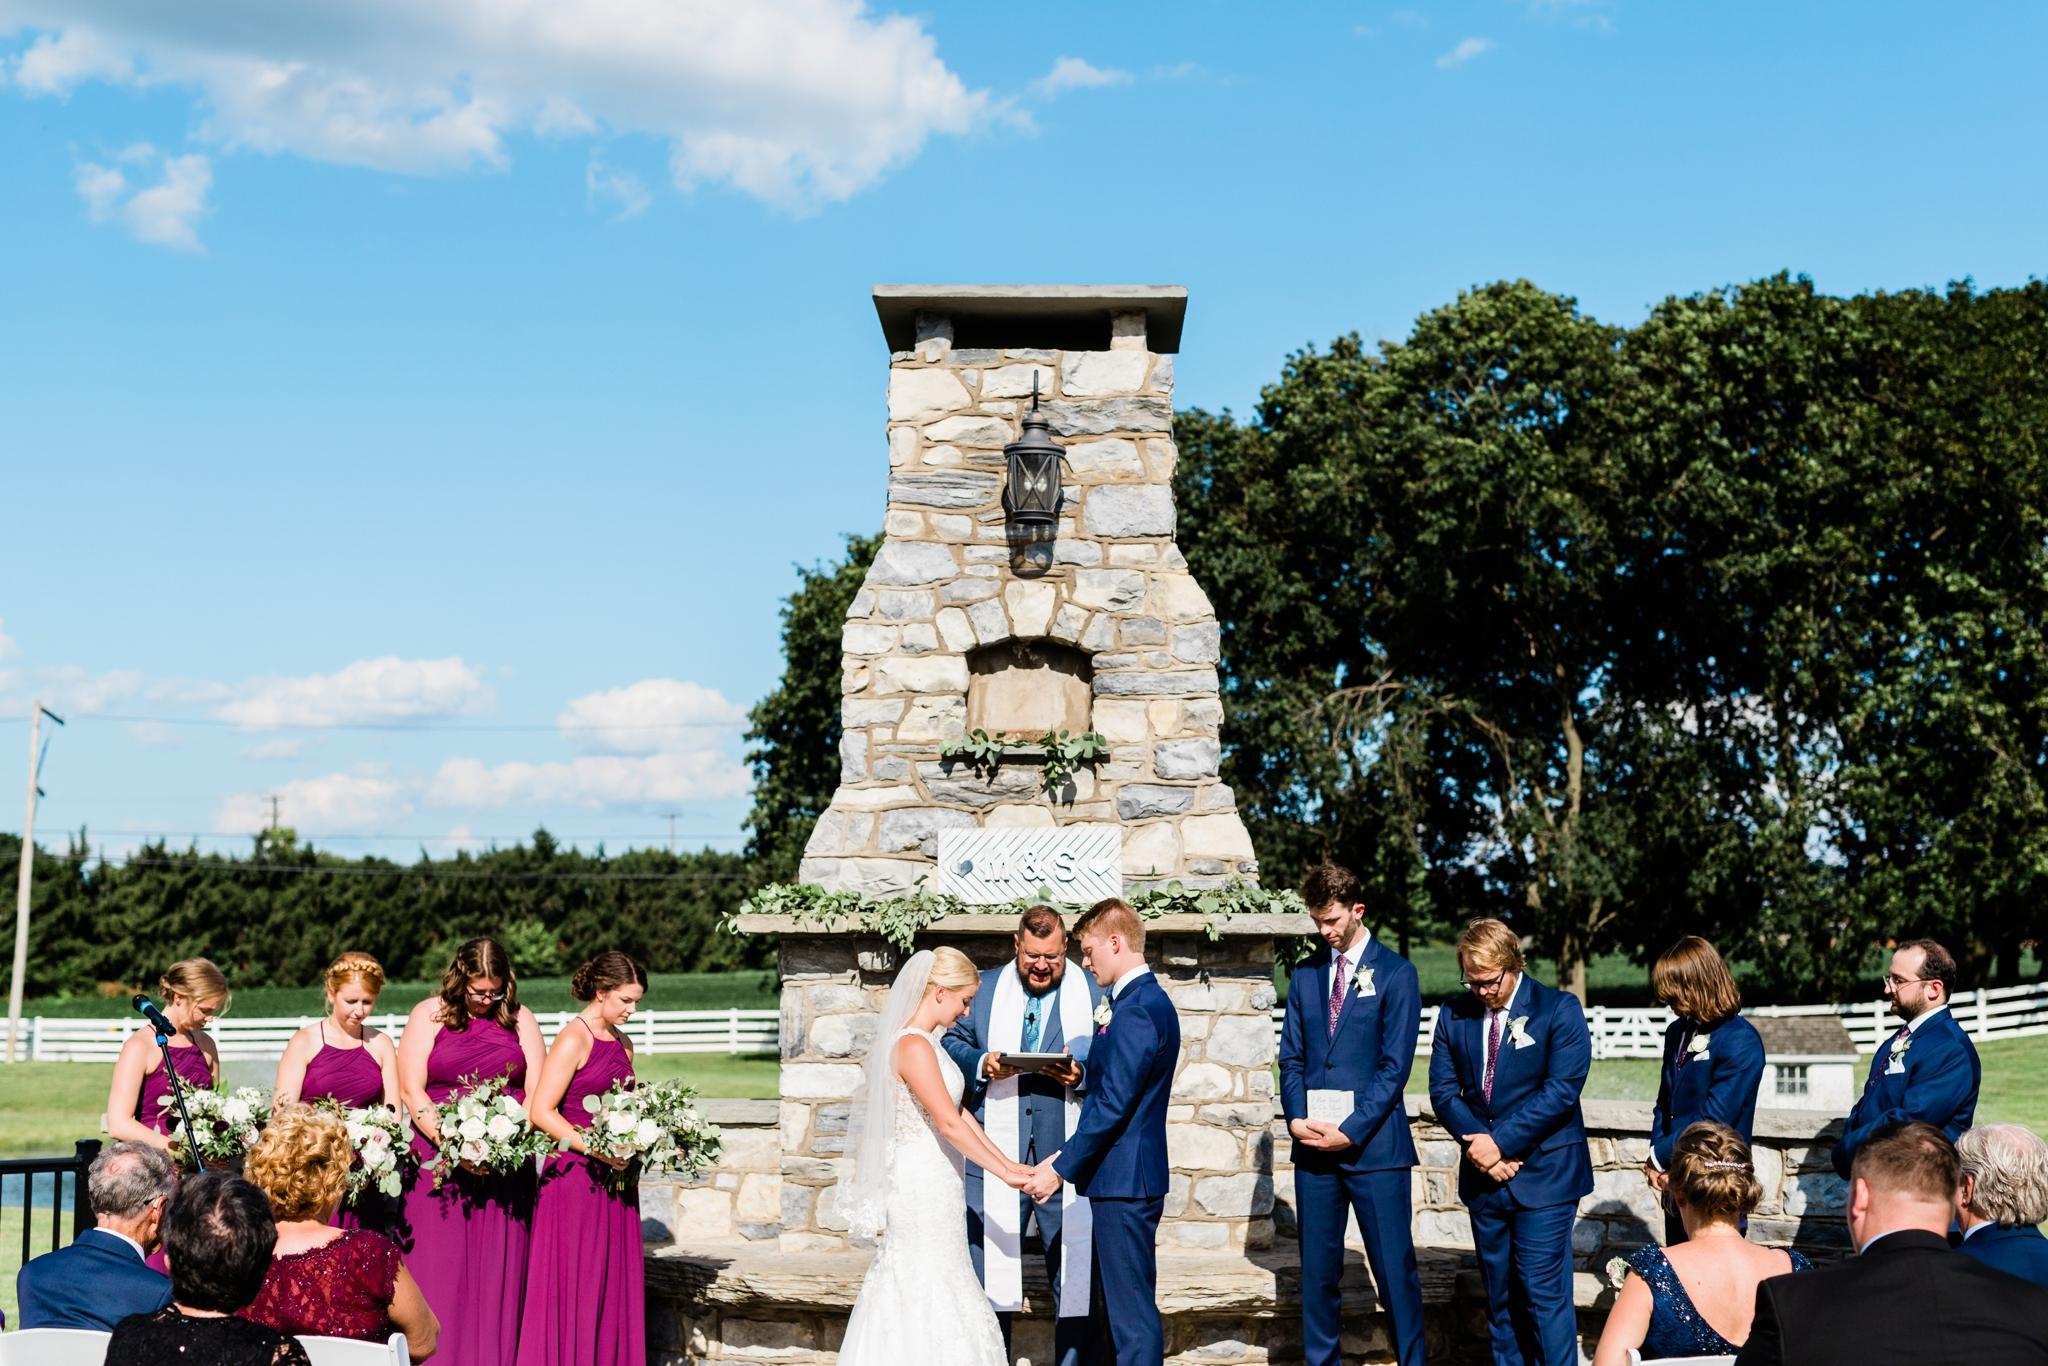 Emily Grace Photography, Lancaster PA Wedding Photographer, Wedding Photography for Unique Couples, The Barn at Silverstone, Lancaster PA Wedding Venue, The Barn at Silverstone Ceremony